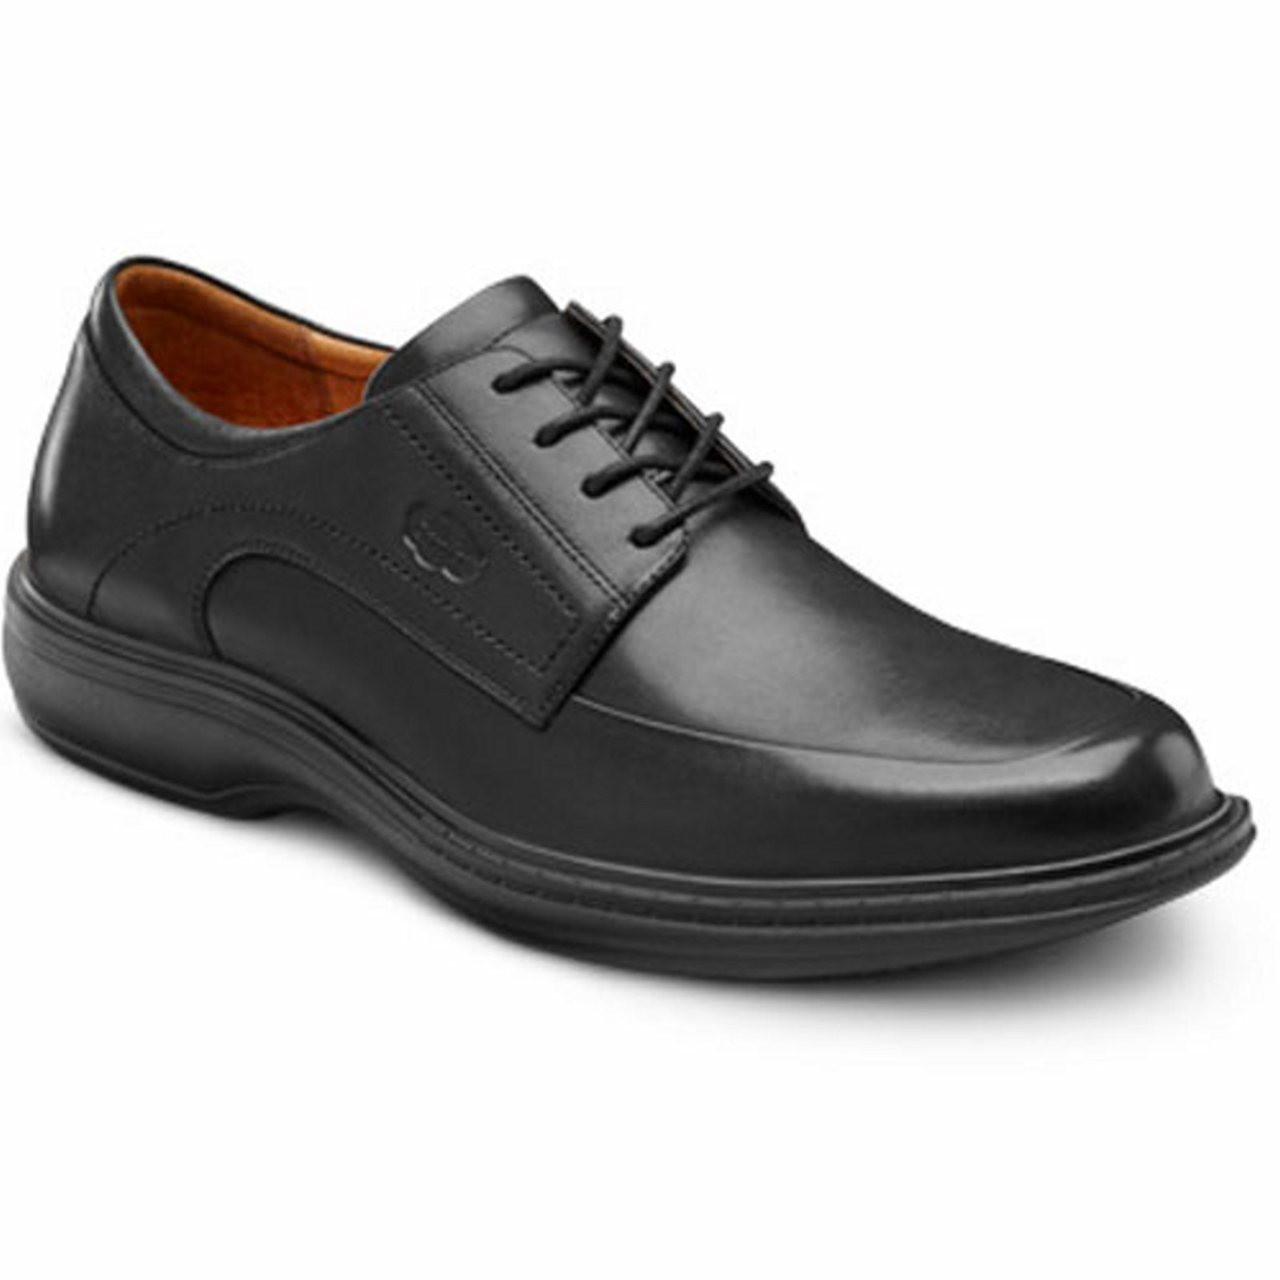 Classic by Dr. Comfort - Men's Therapeutic Diabetic Dress Shoe